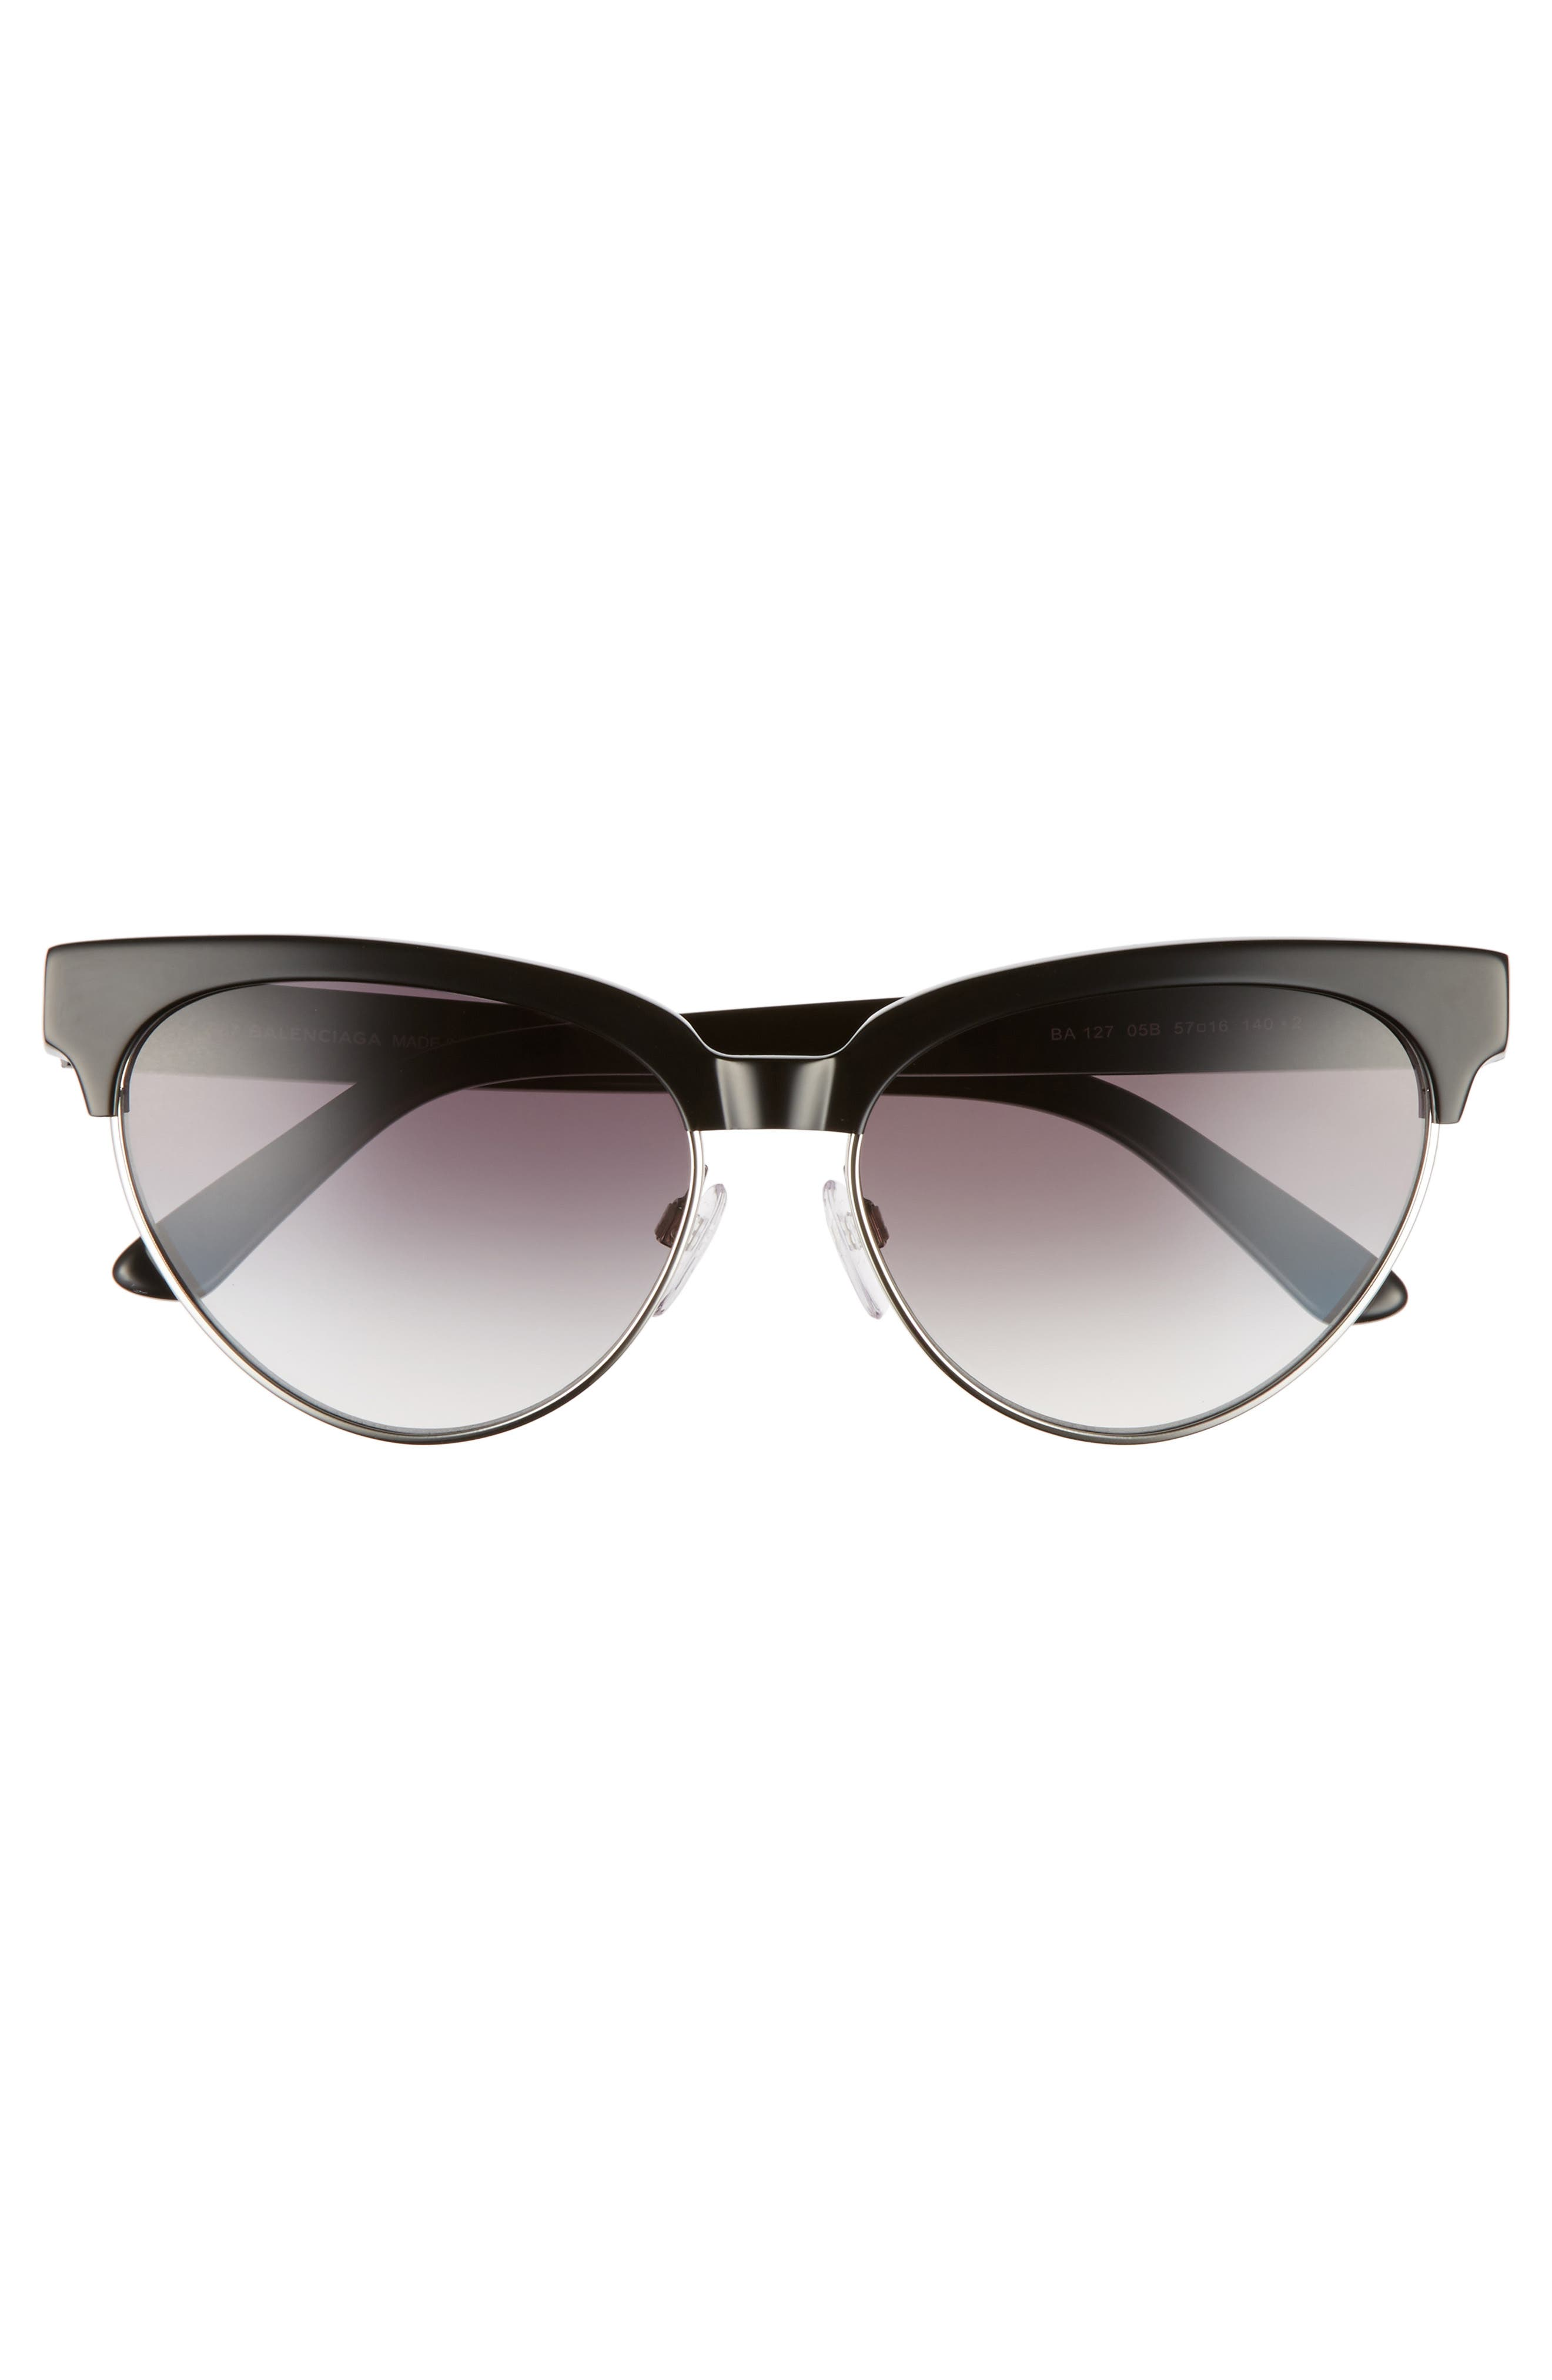 57mm Gradient Cat Eye Sunglasses,                             Alternate thumbnail 3, color,                             001